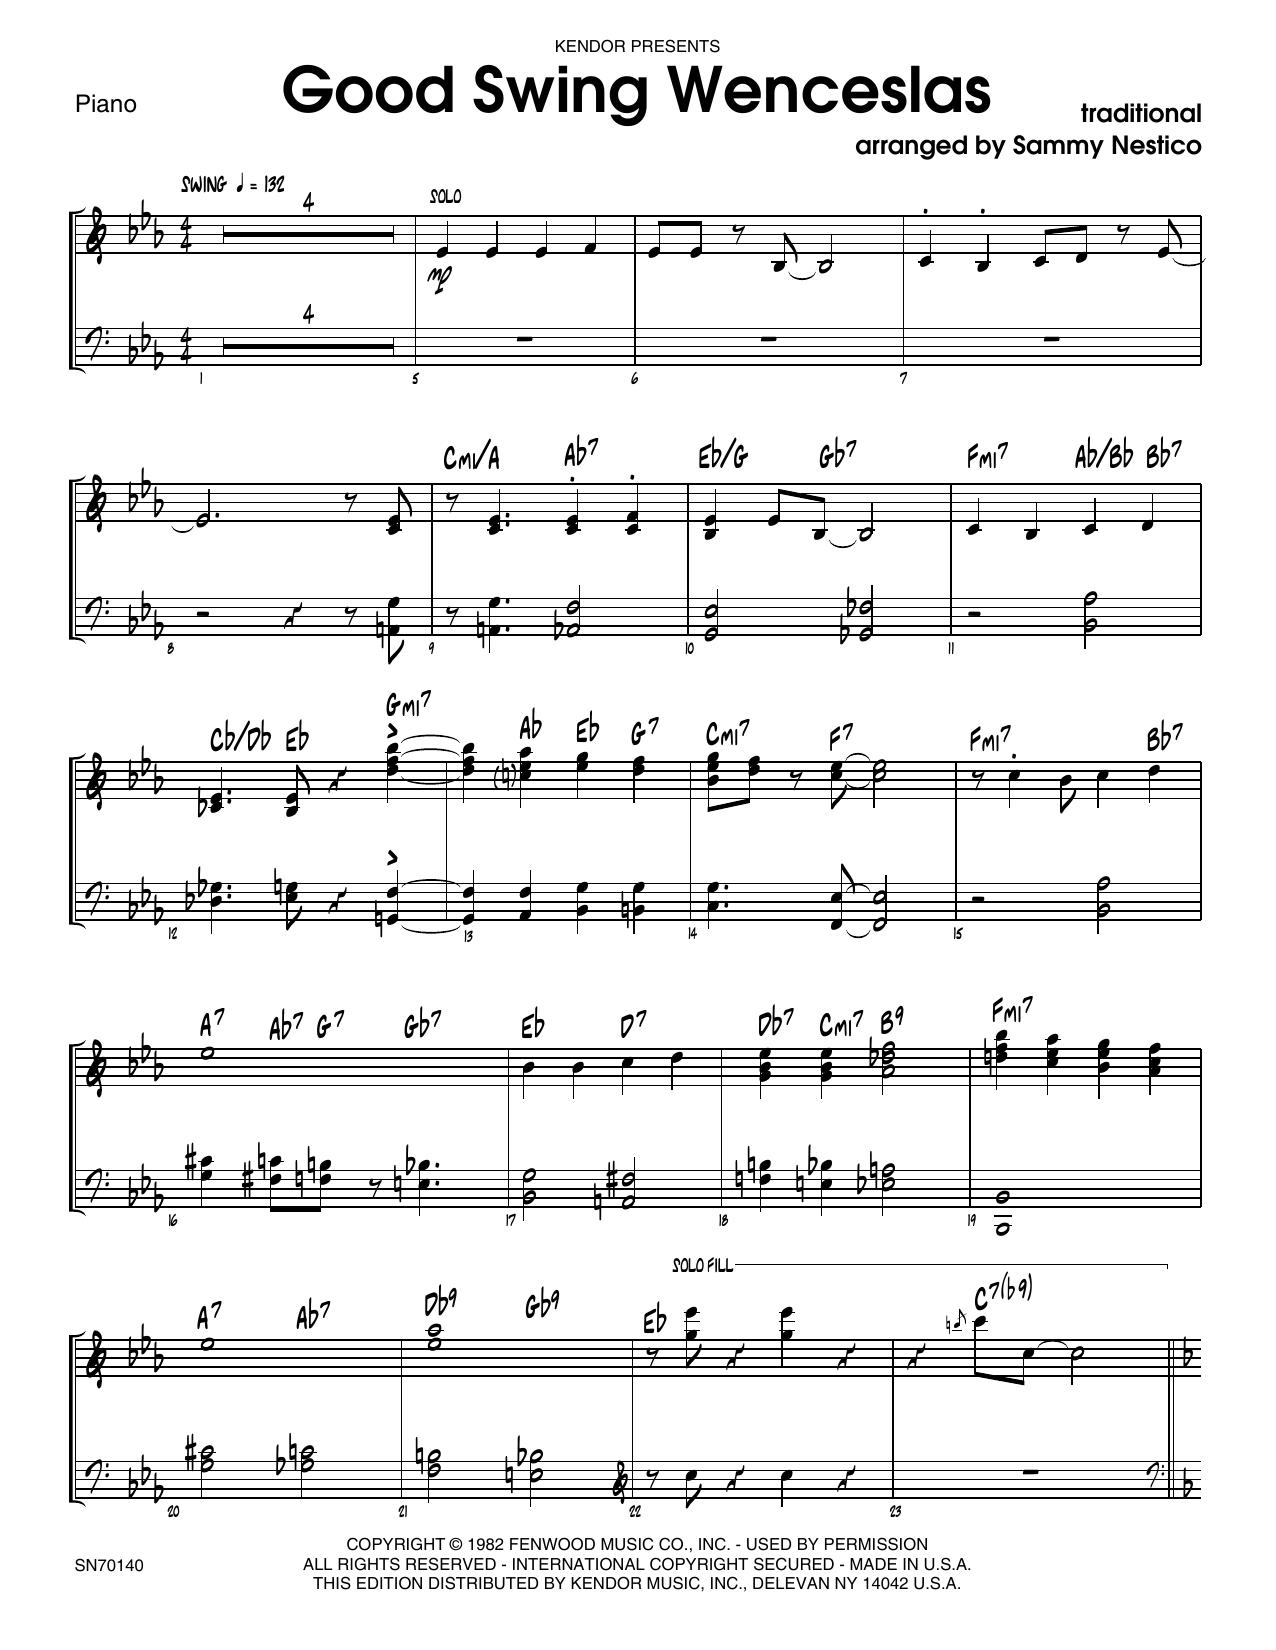 Good Swing Wenceslas - Piano Sheet Music